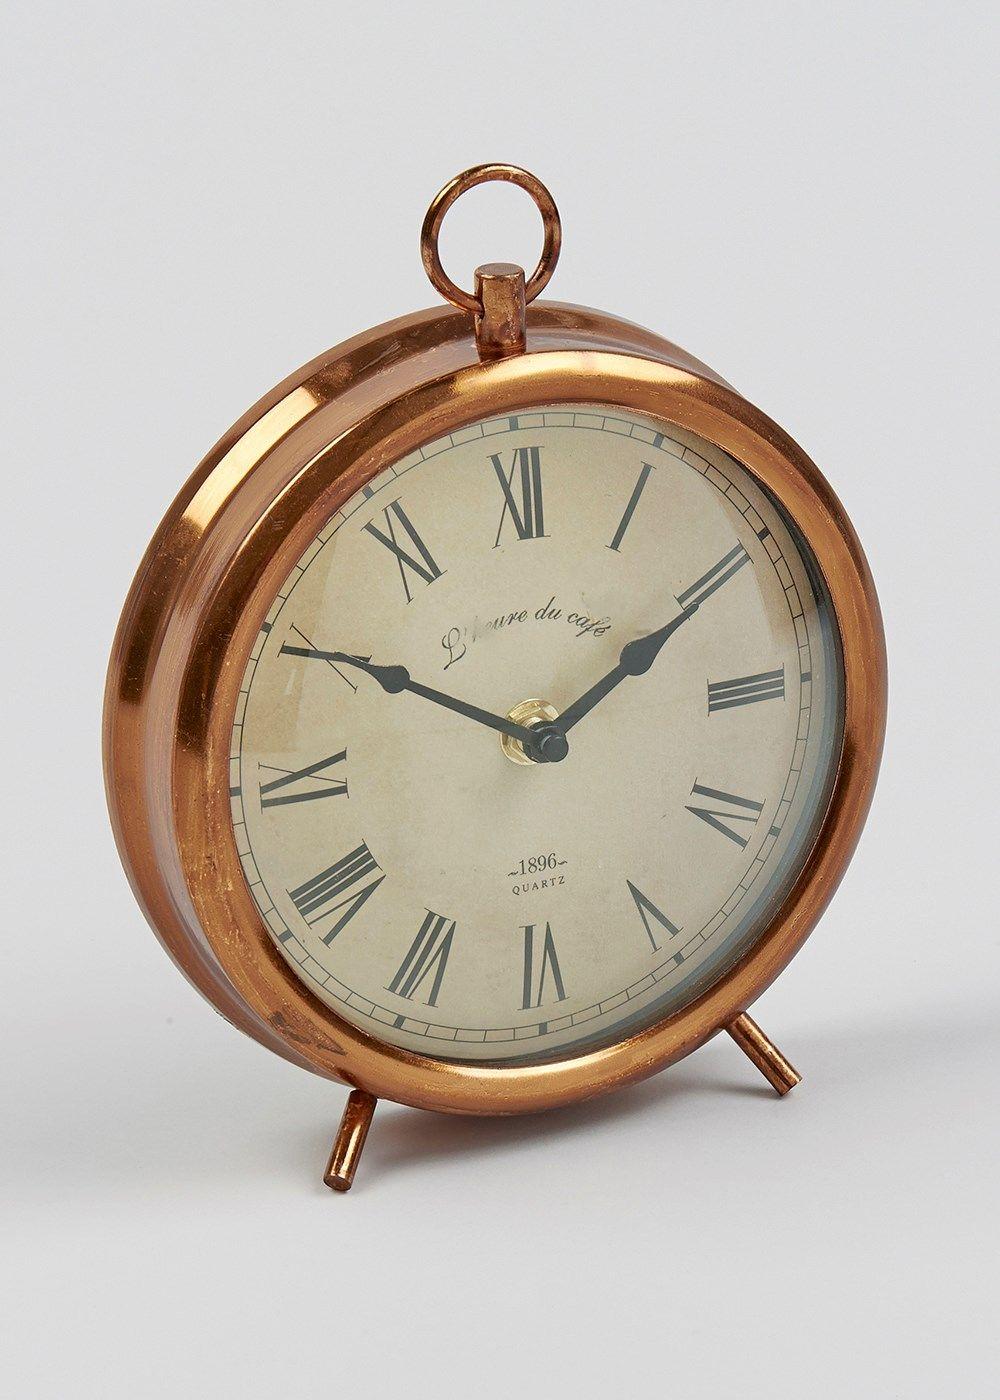 Round Antique Style Mantle Clock (19cm x 17cm) | Mantelpiece, Clocks ...